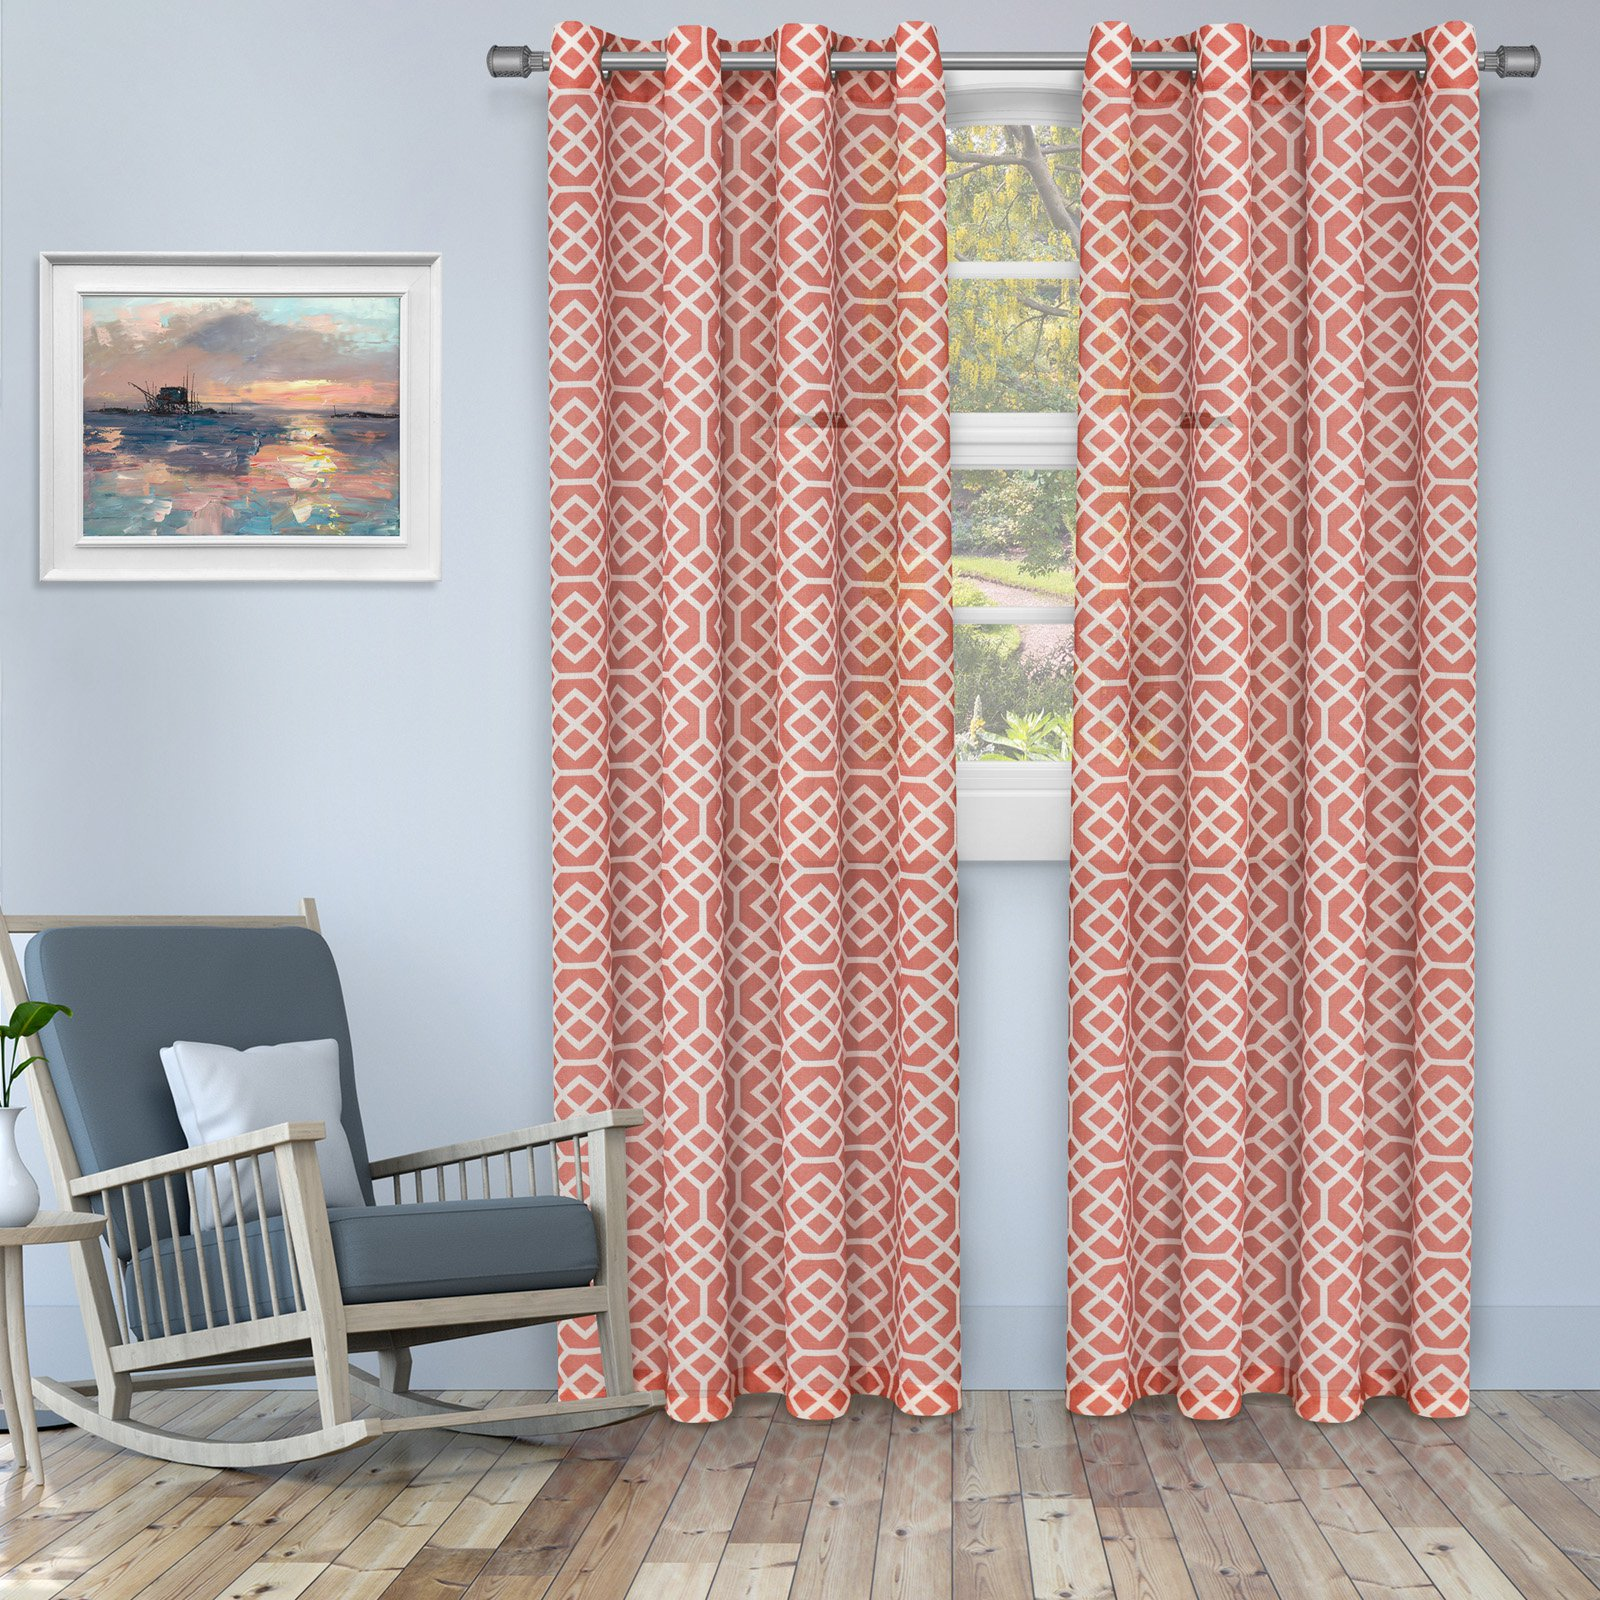 Superior Honeycomb Printed Sheer Panel Pair Panel Curtains